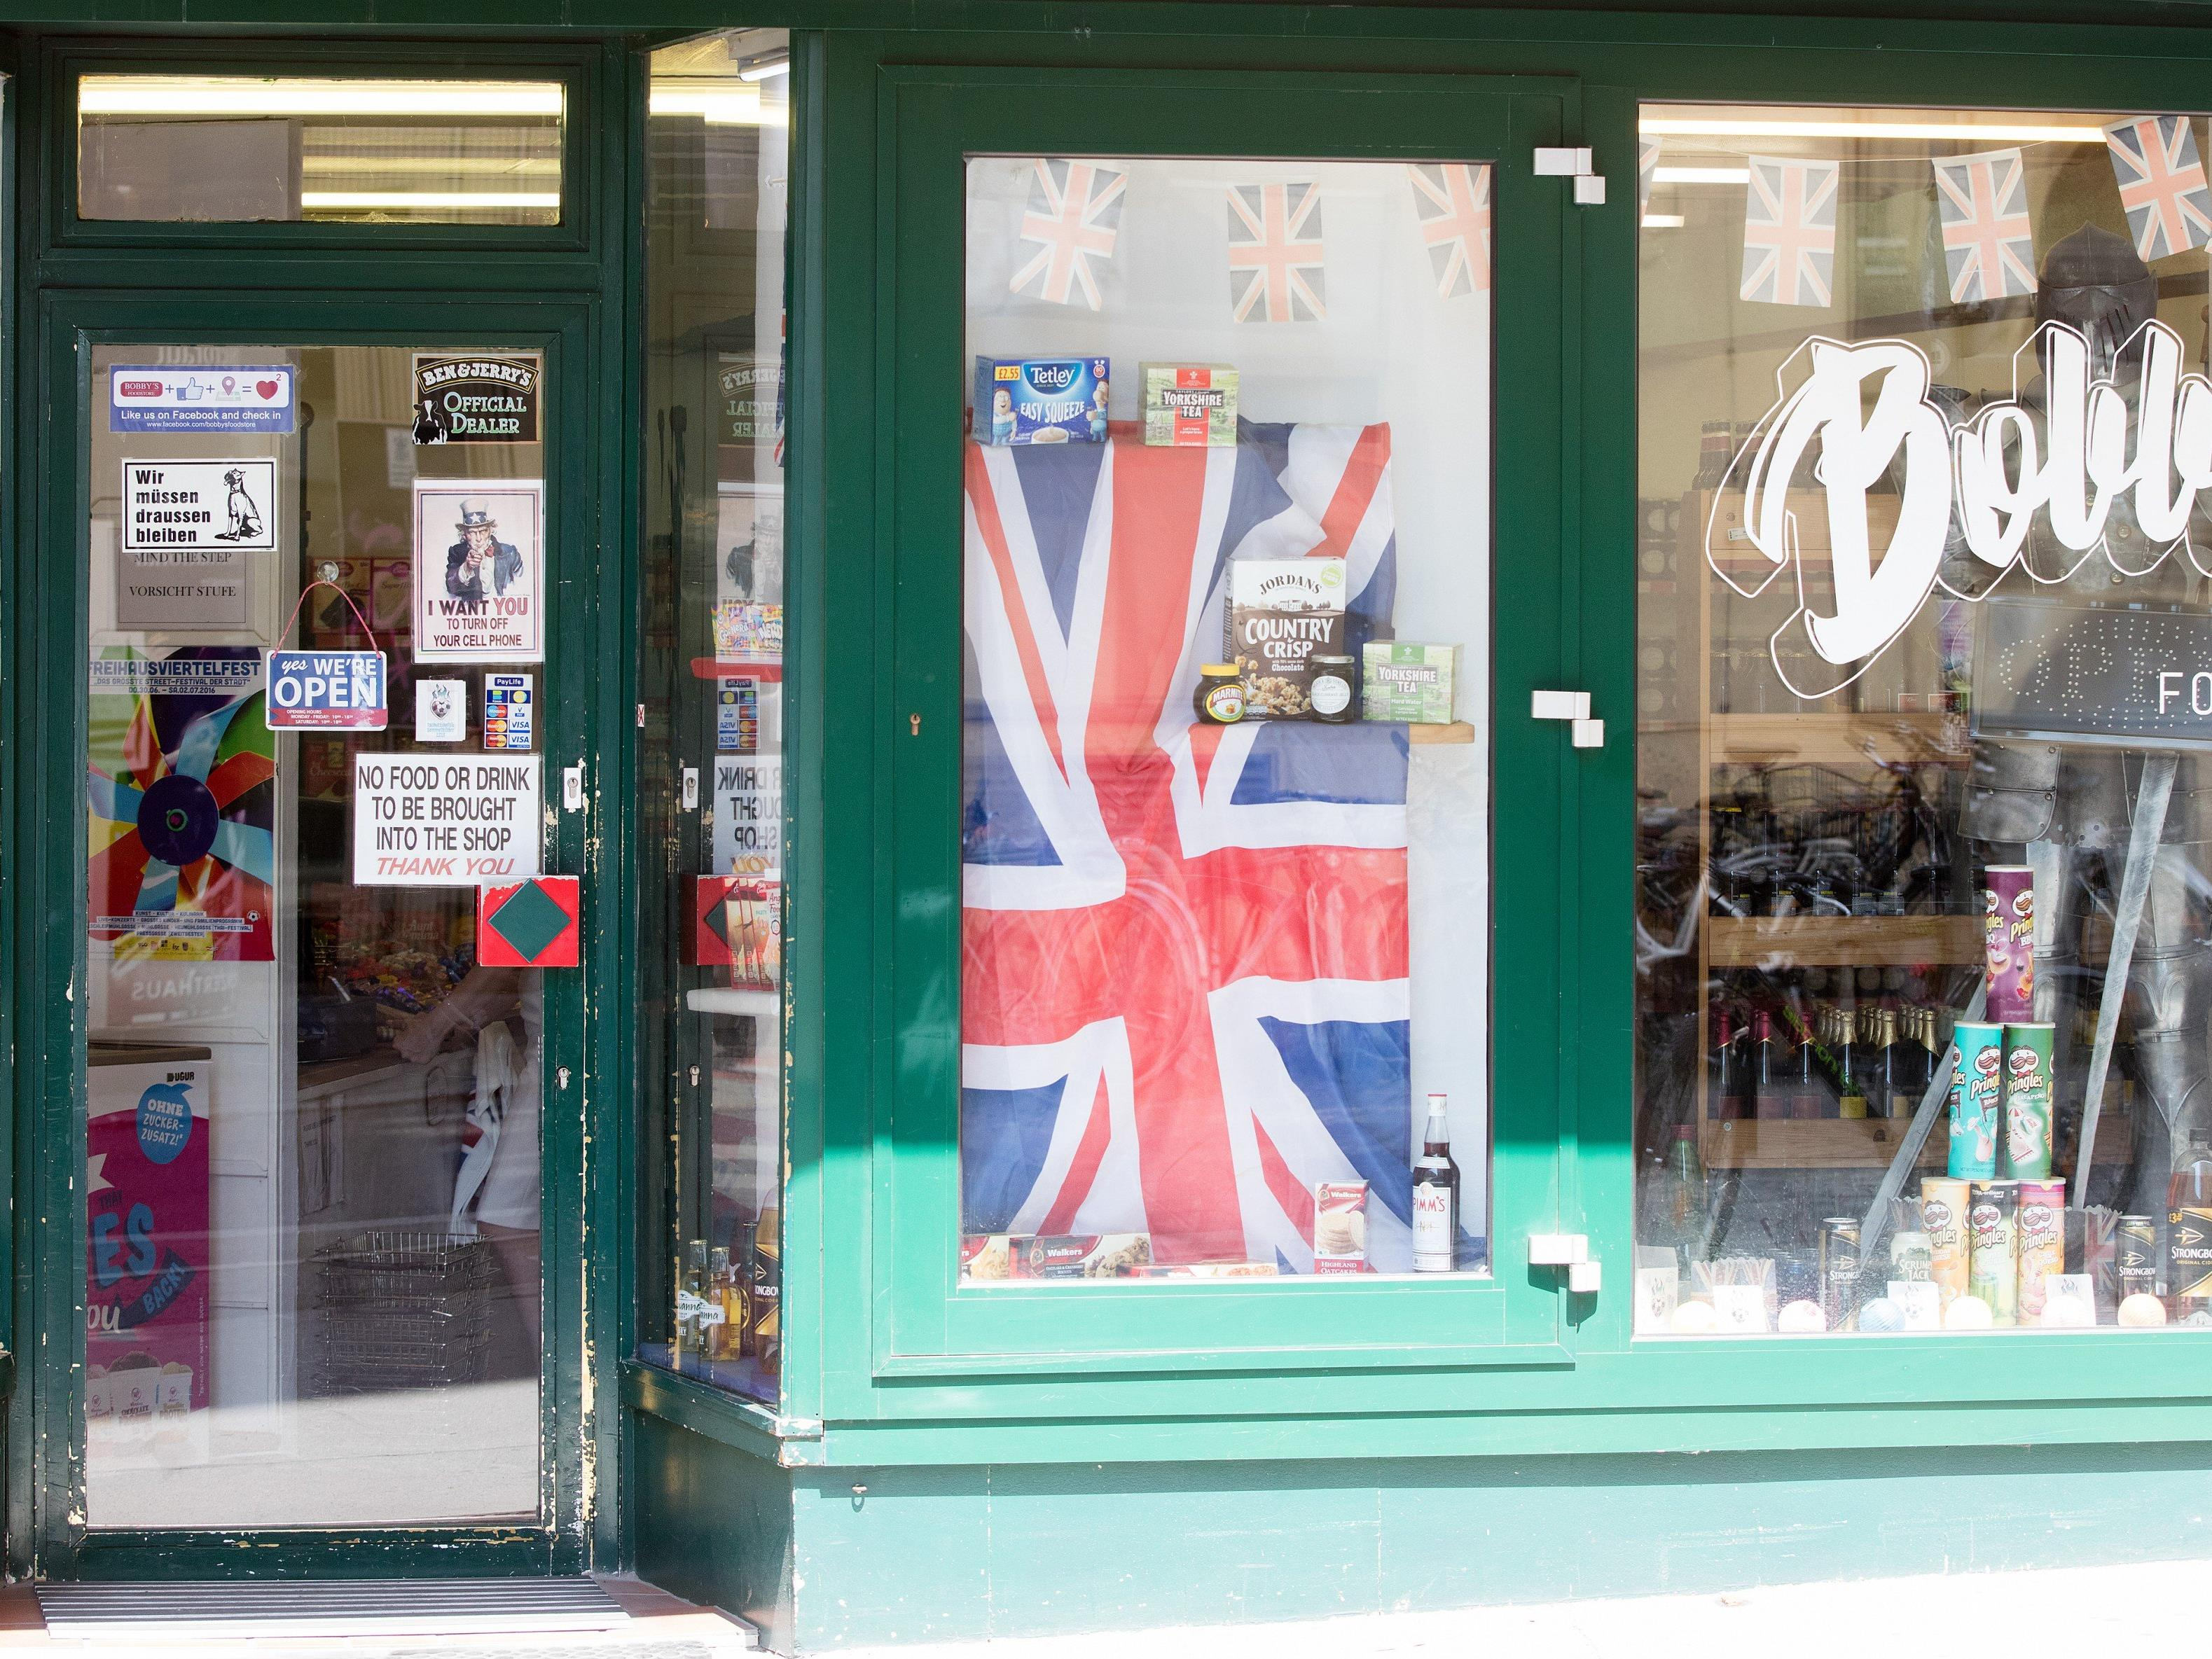 Gelassenheit im britischen Foodstore in Wien